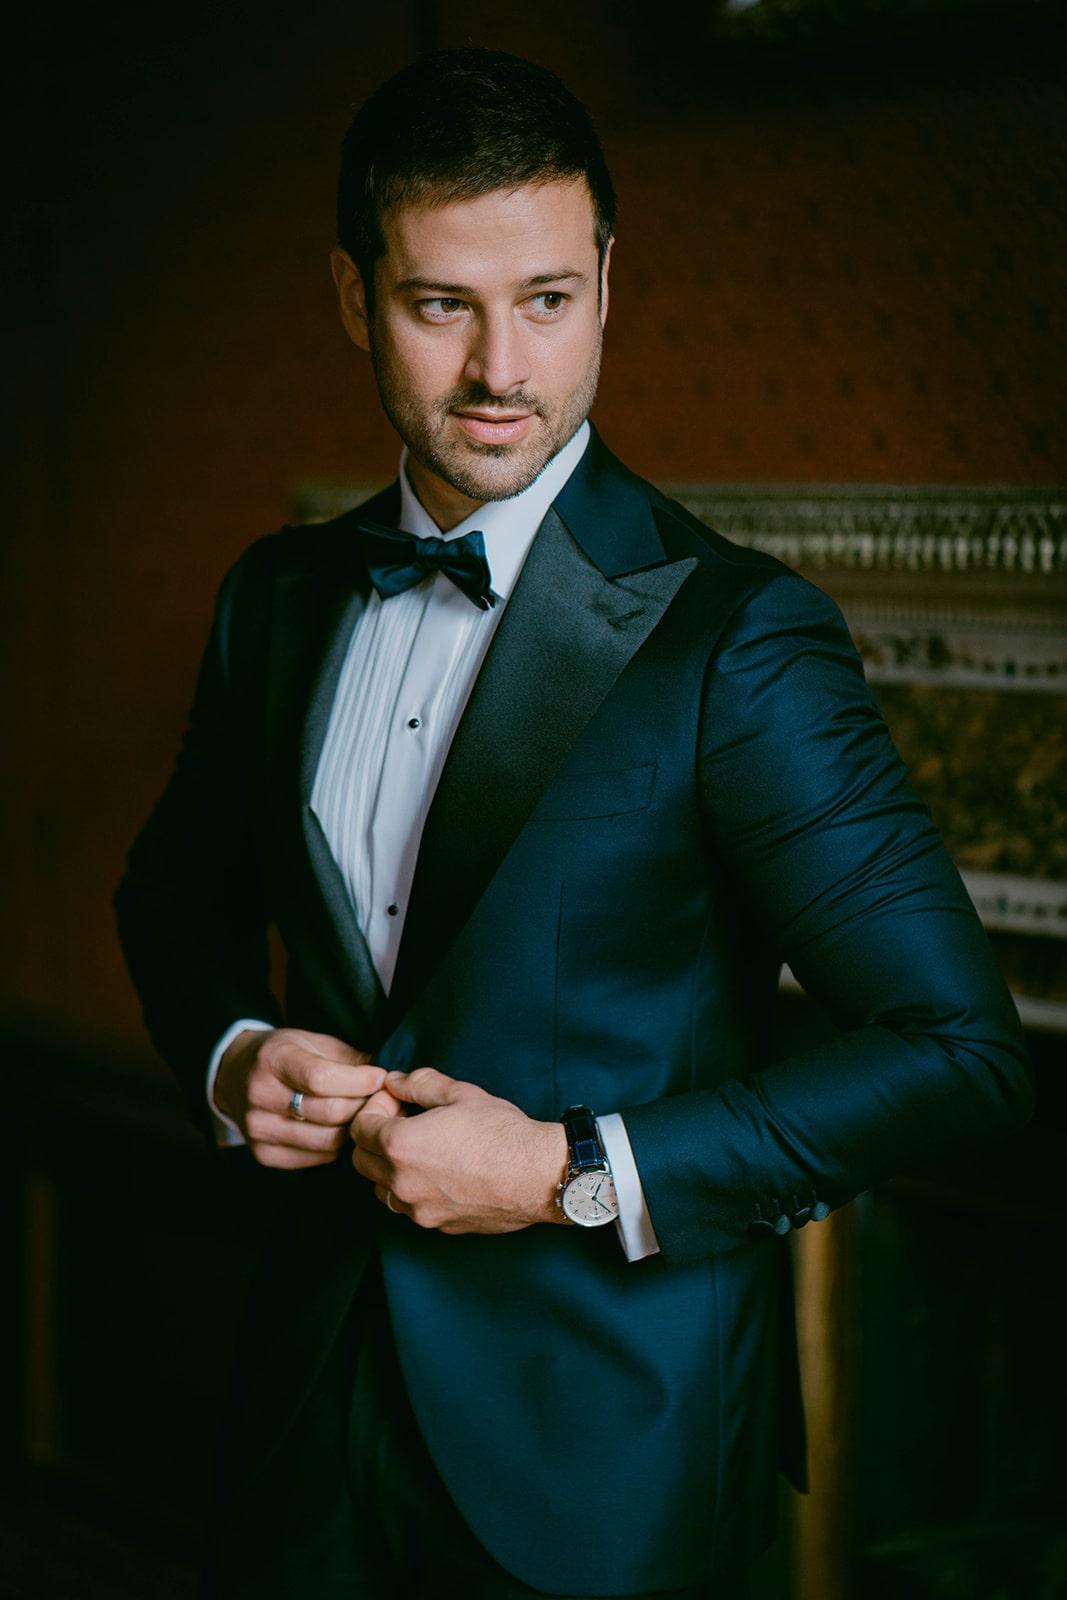 groom suit for wedding